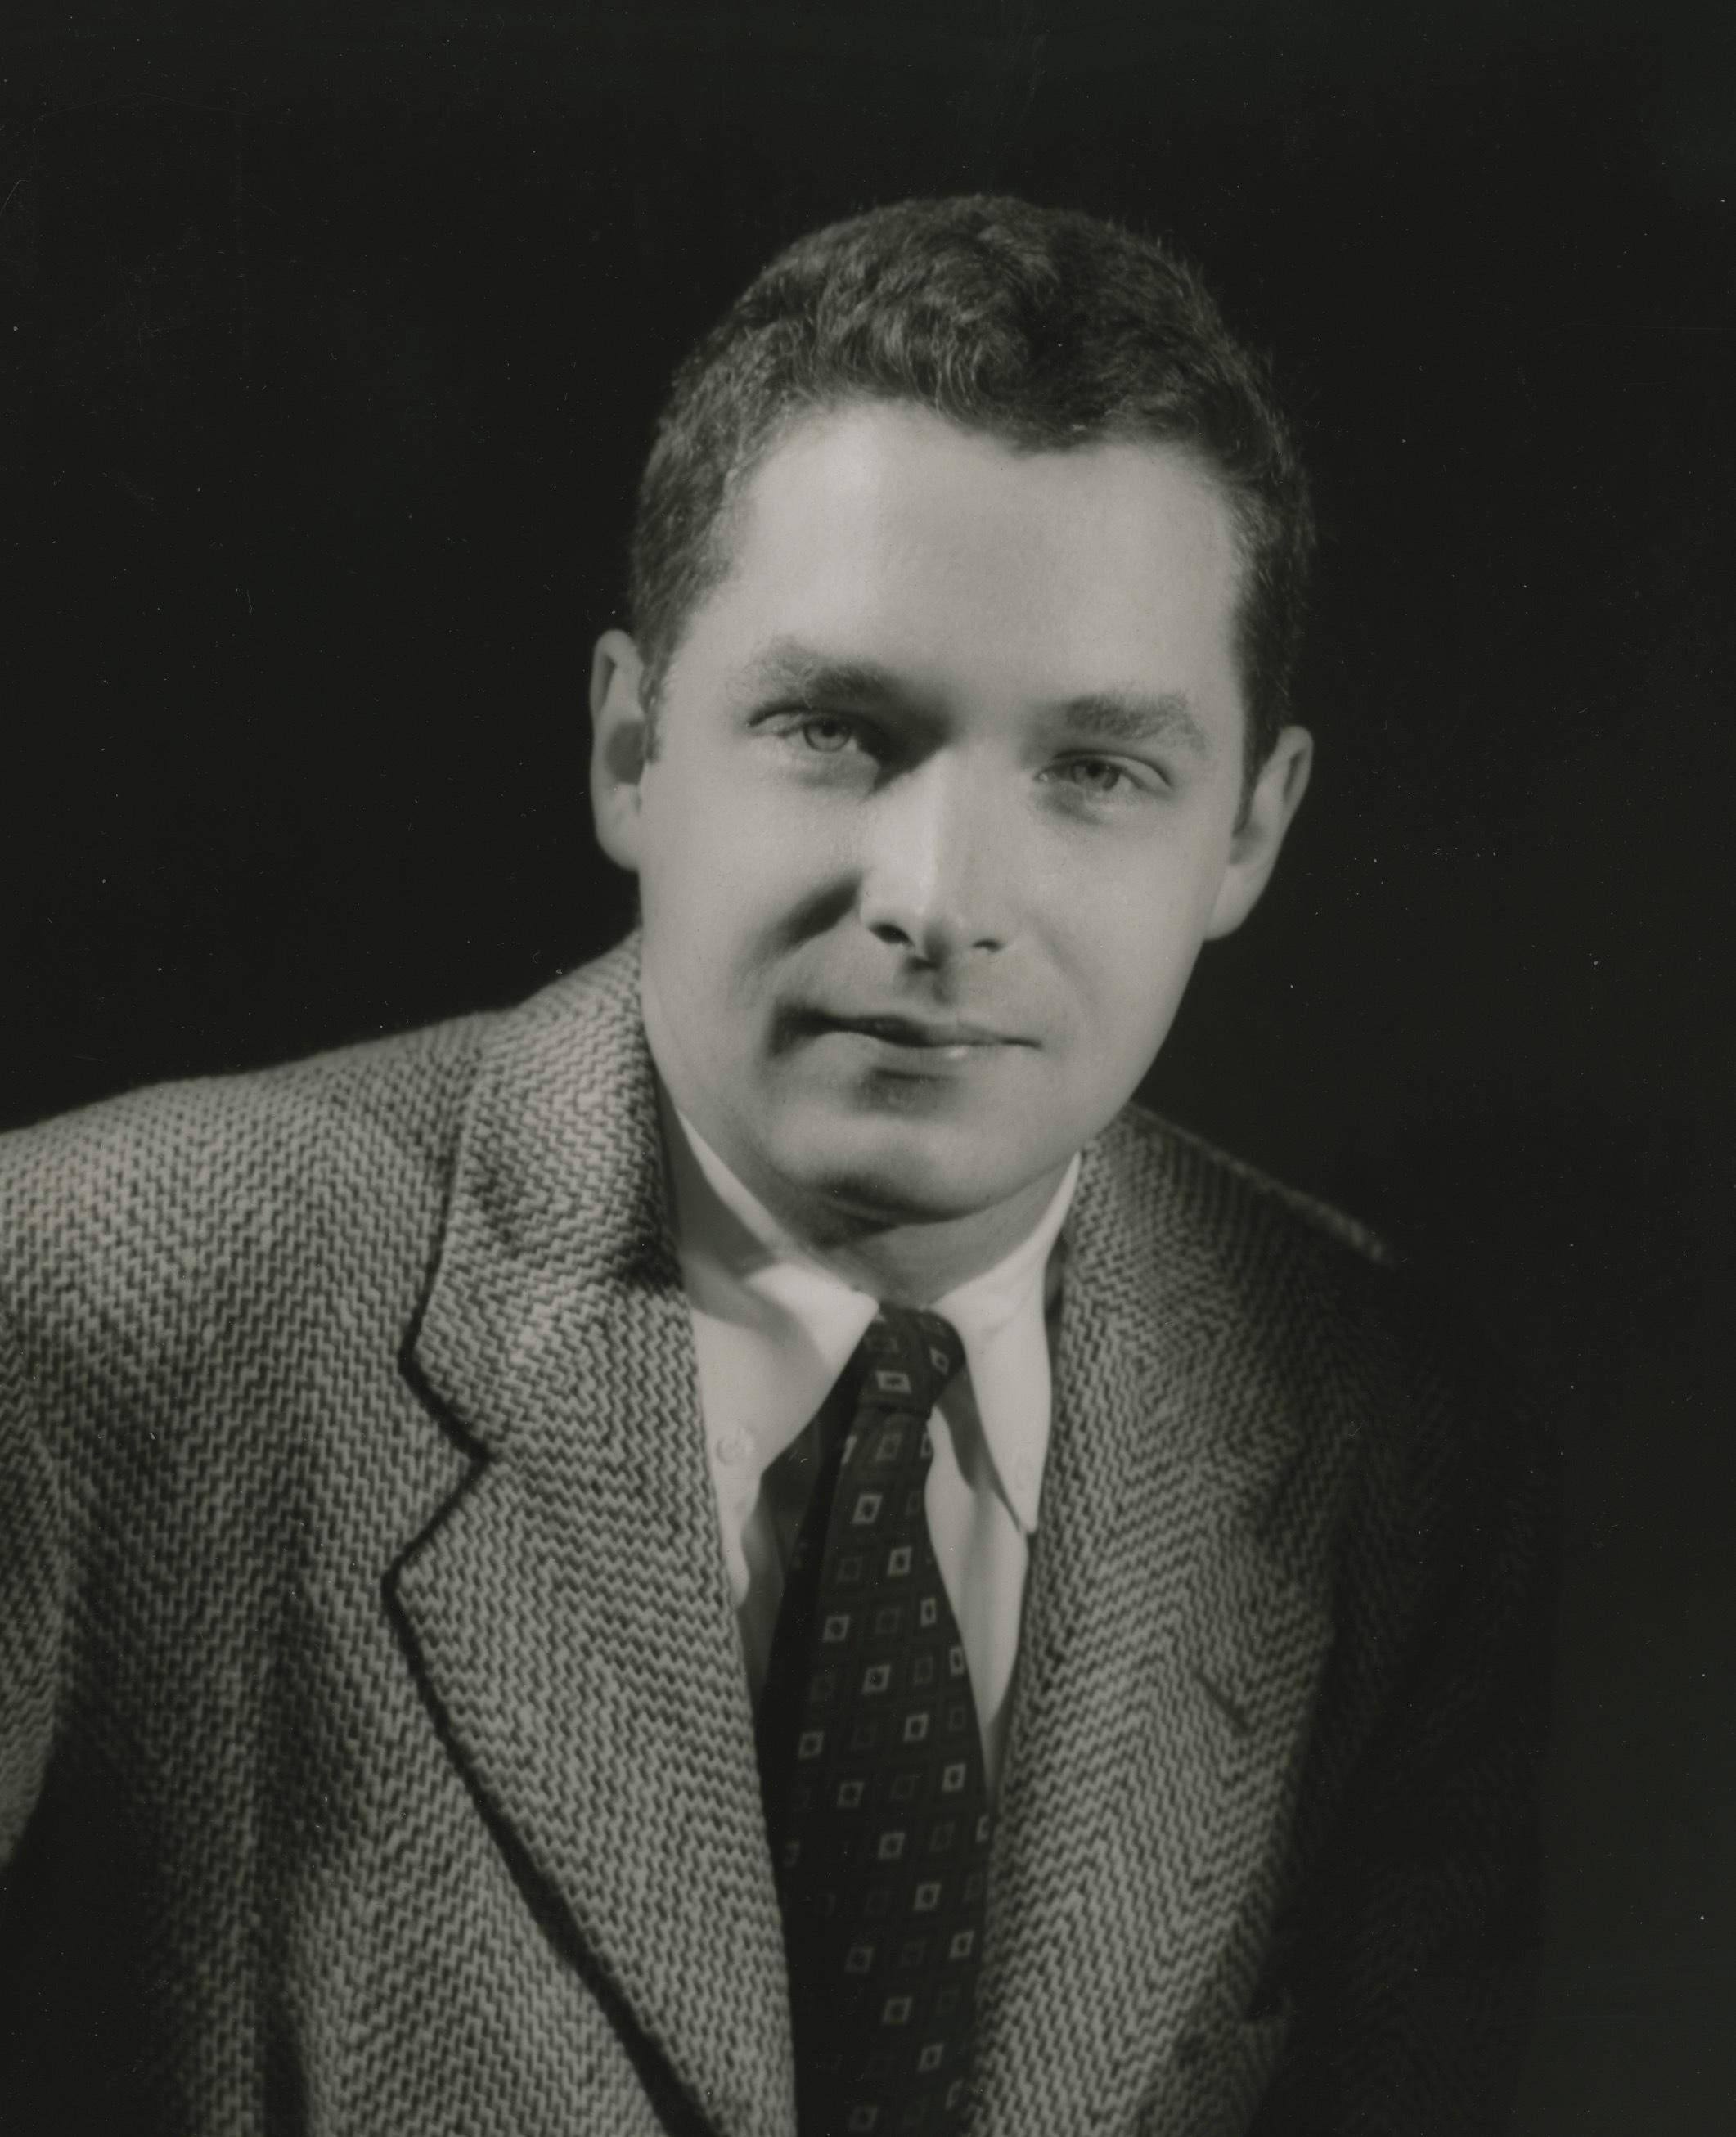 William Franklin Grisham